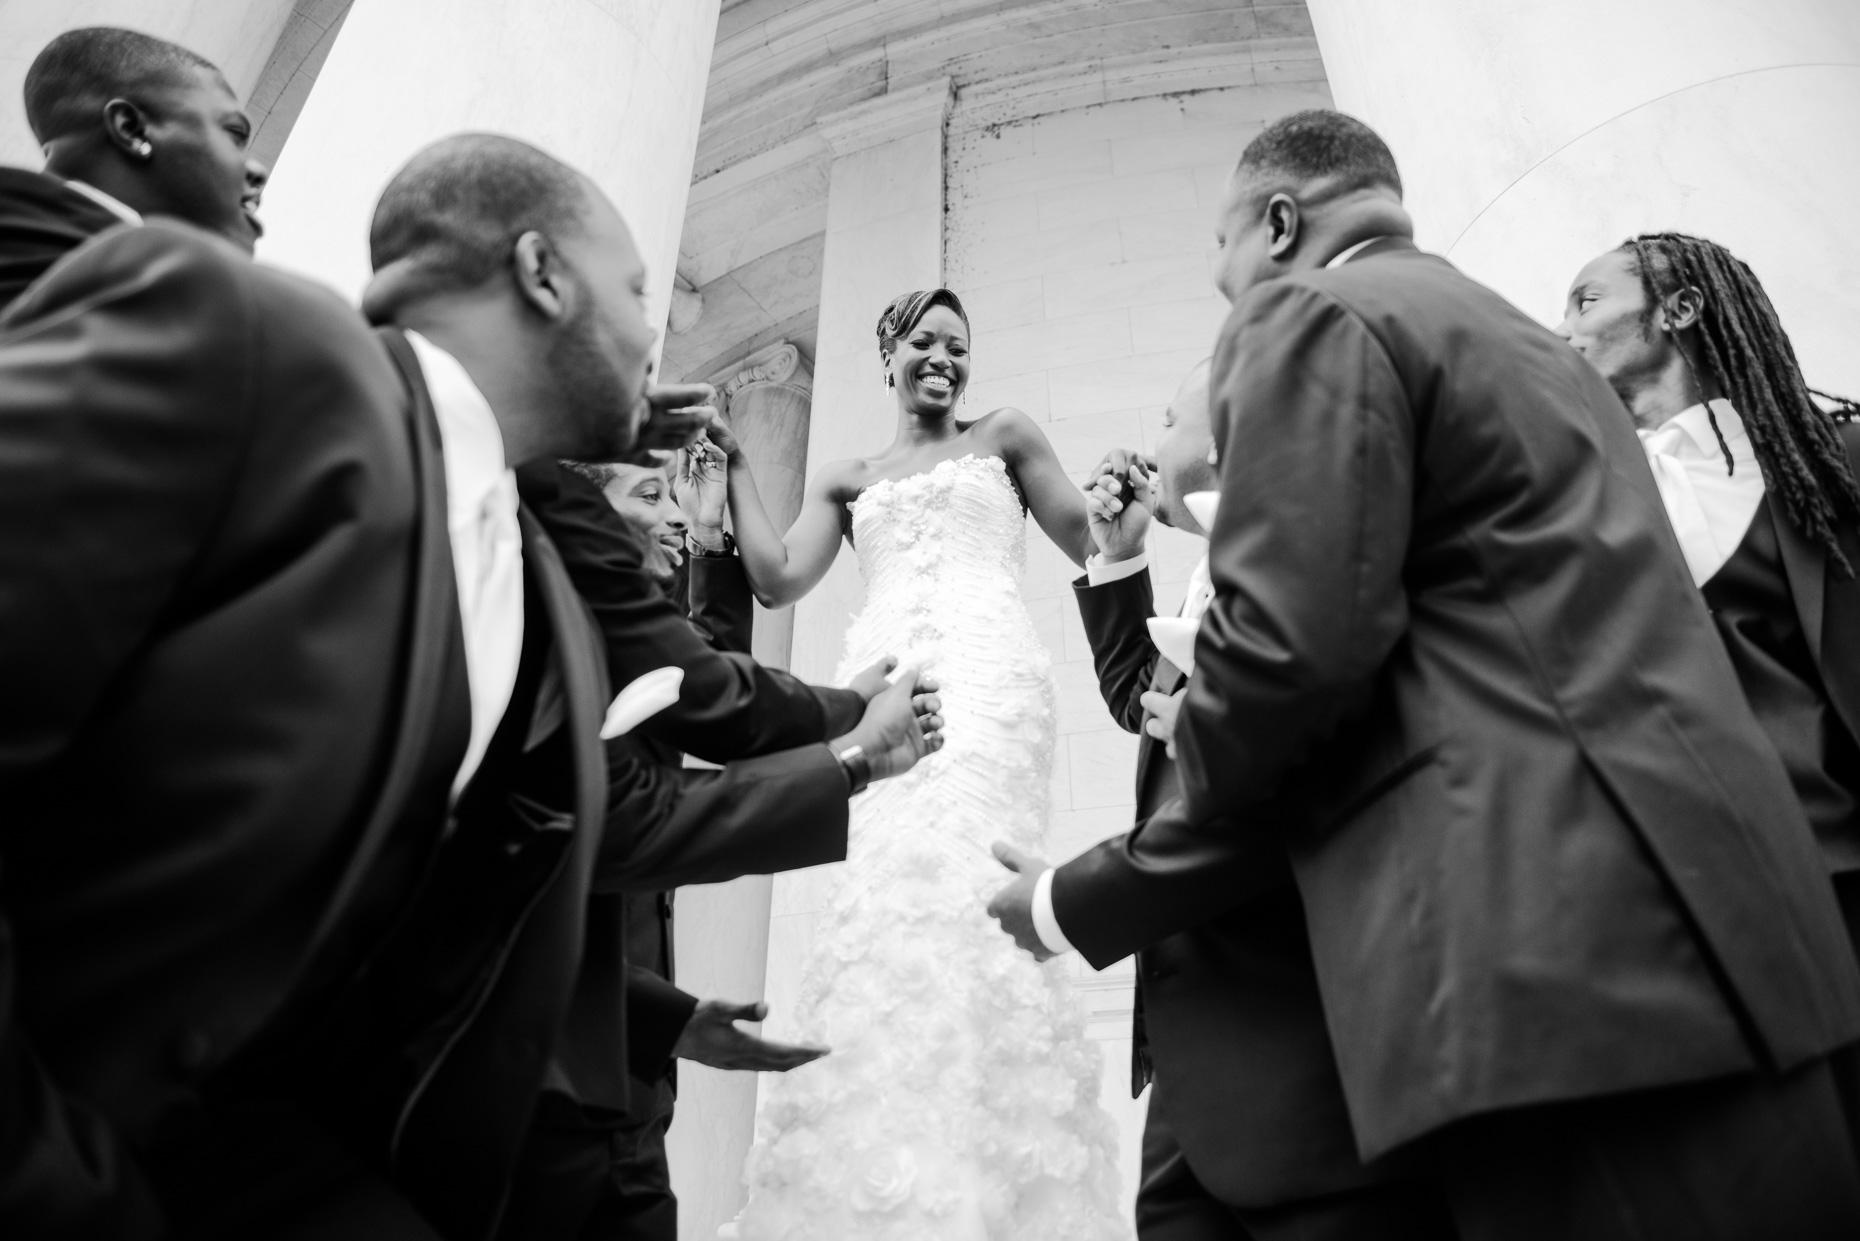 Weddings by Elliott O'Donovan - Washington DC_-21.jpg